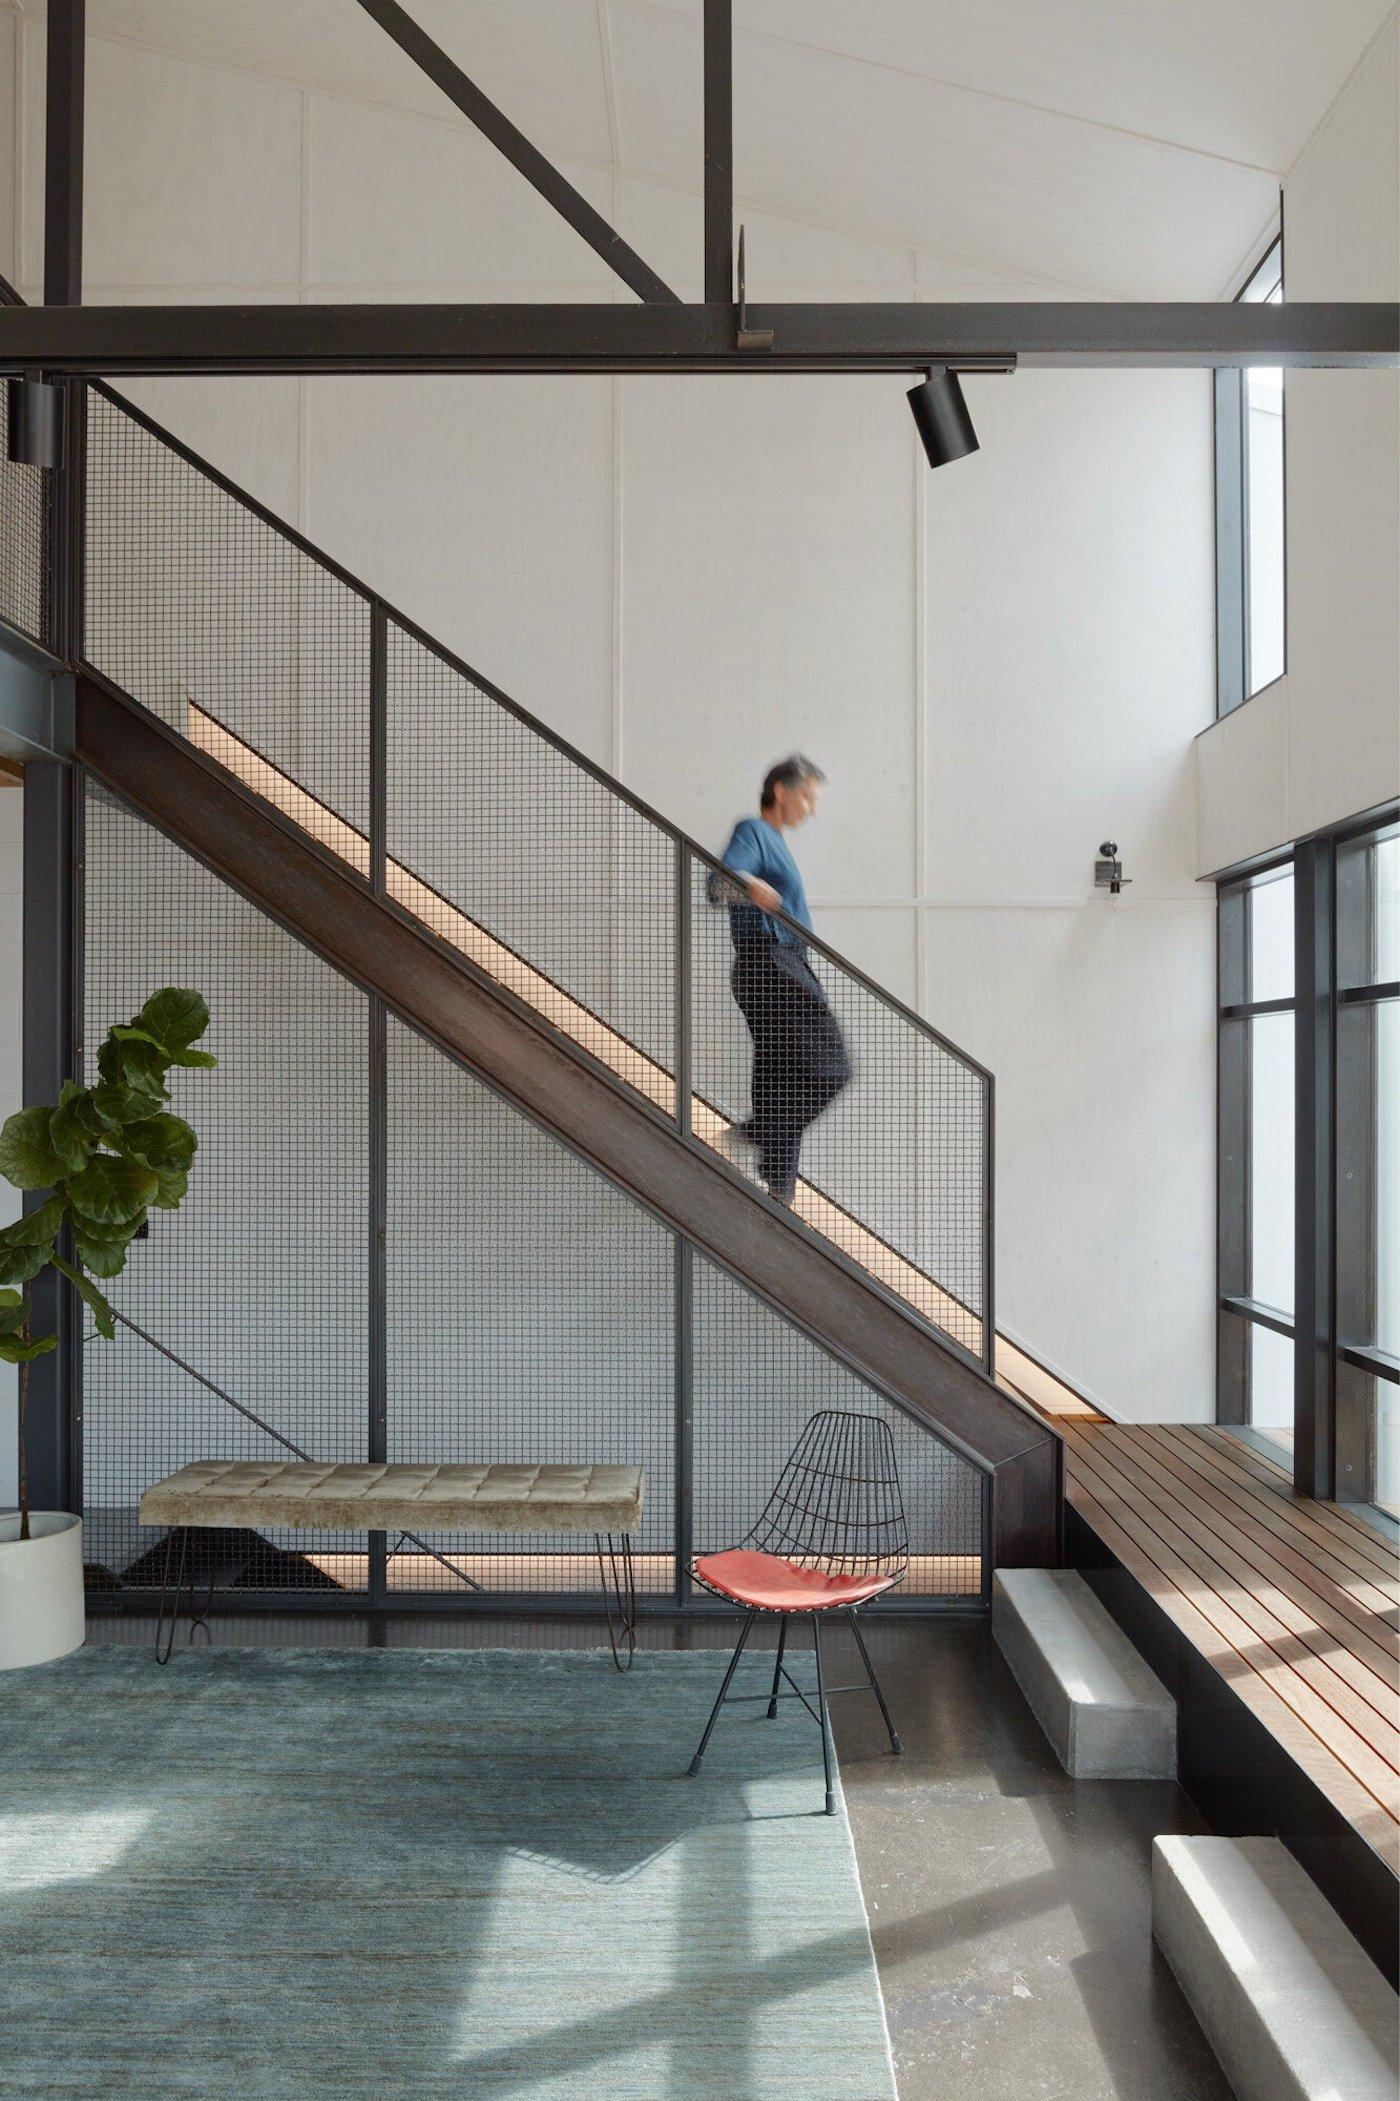 Eco Edition_Breathe Architecture_Warehouse Greenhouse_Architecture sustainability 6-min